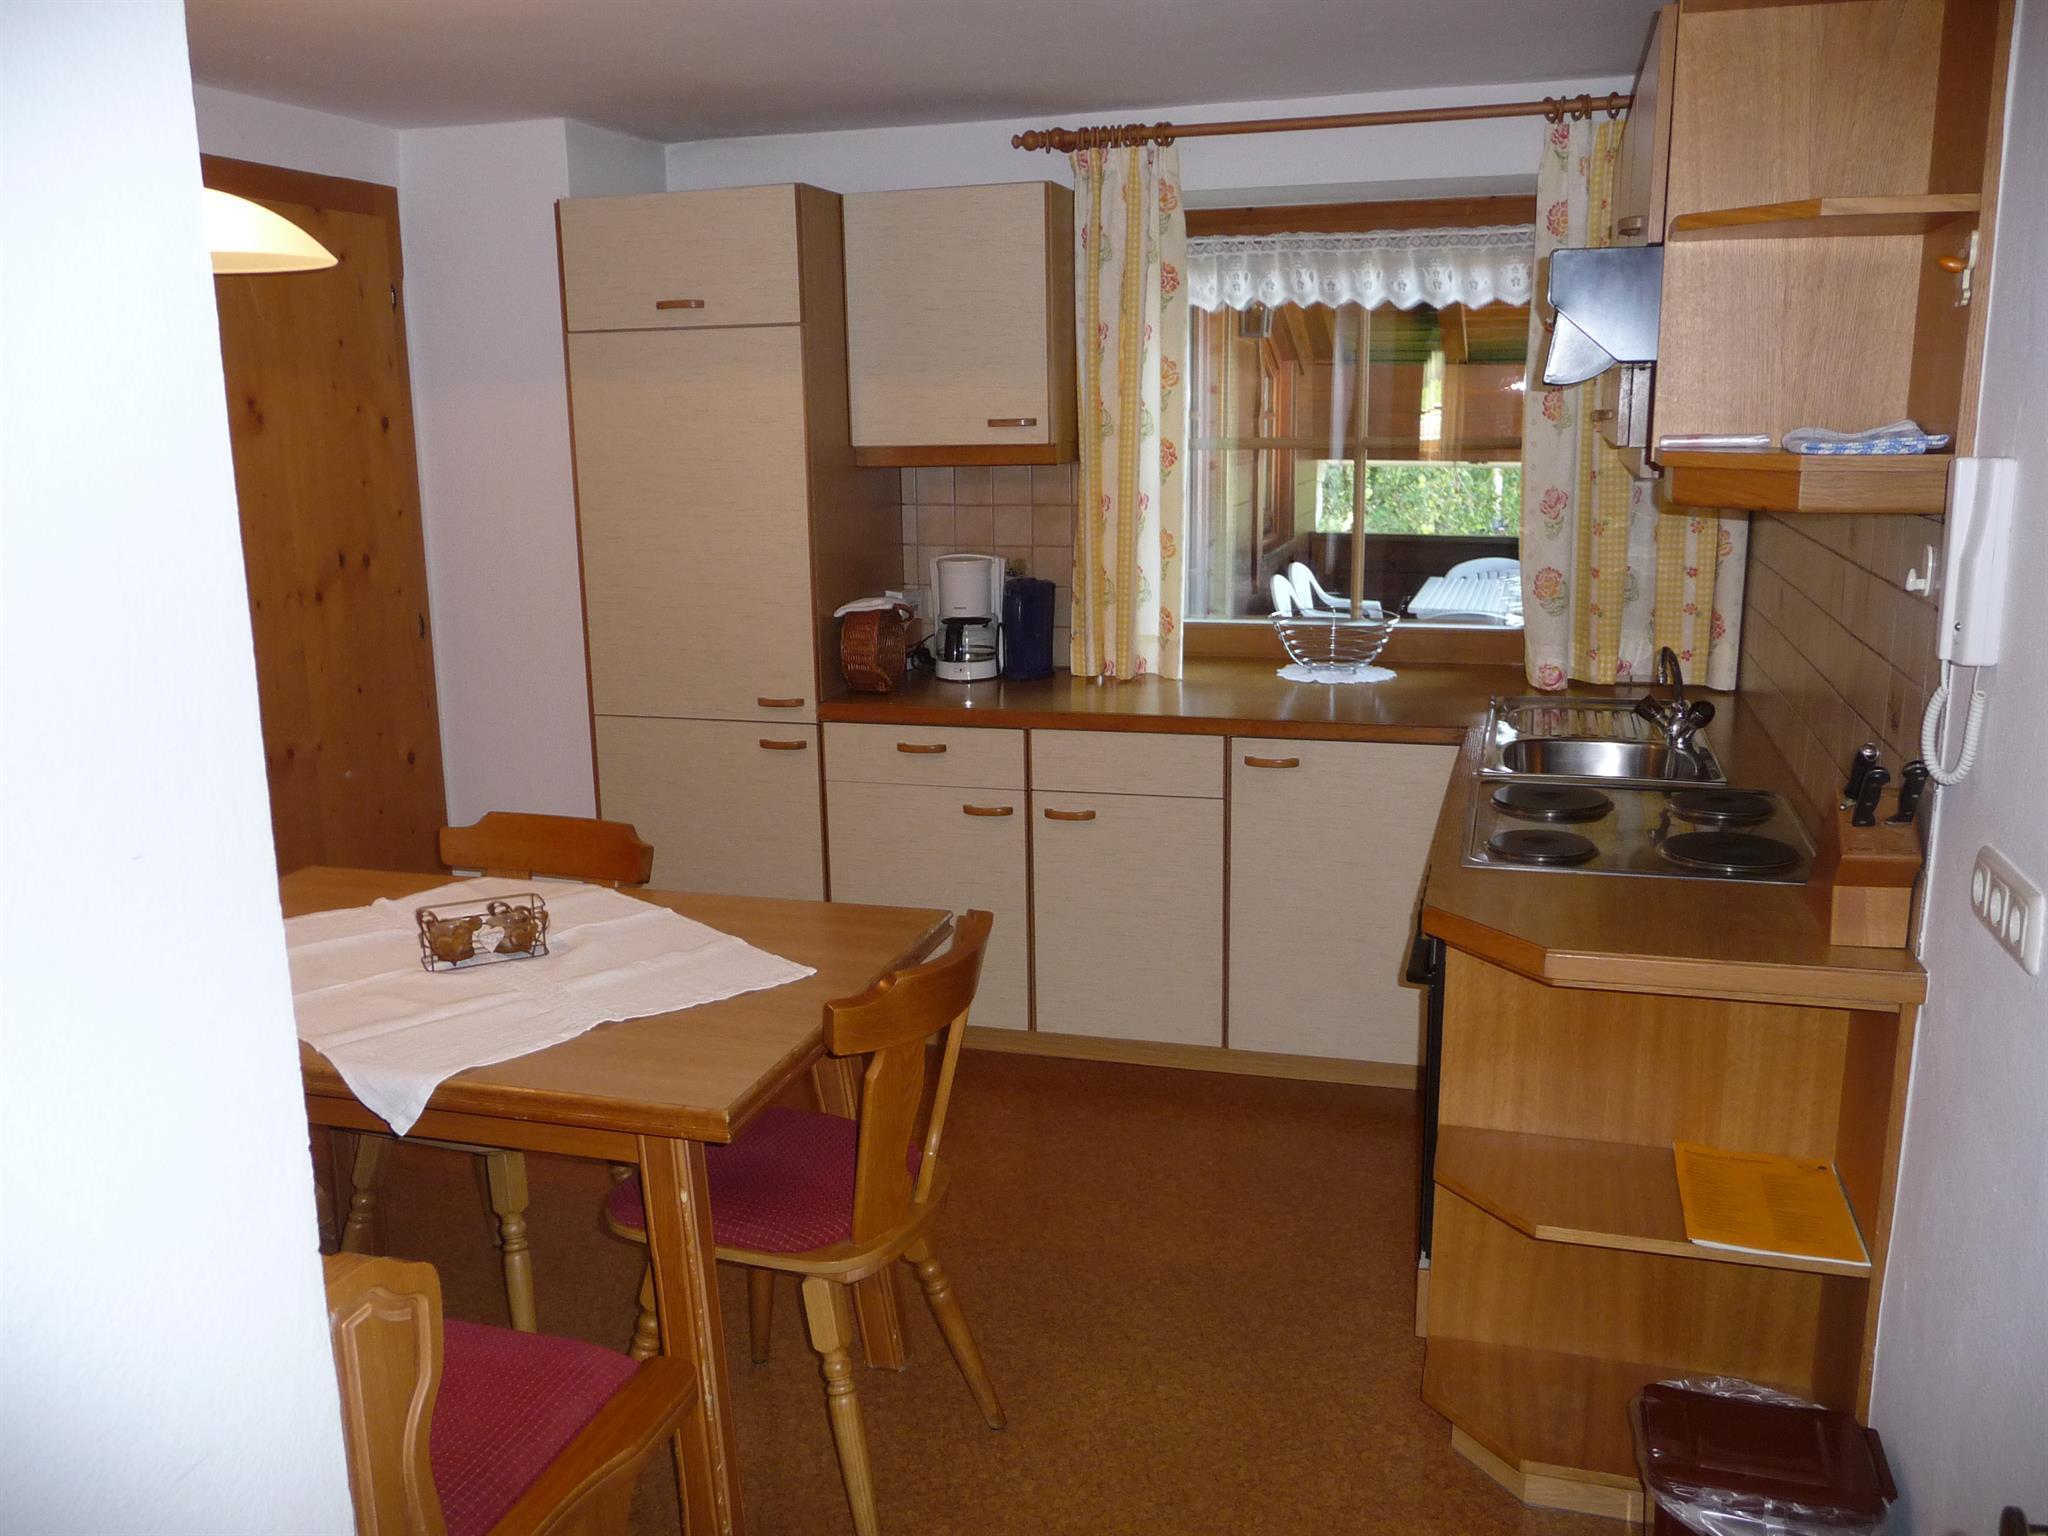 Appartement de vacances Haus Lindeneck - Erika Schwentner Grosses Appartement, 2 Räume/Südbalkon (627210), Kössen, Kaiserwinkl, Tyrol, Autriche, image 21